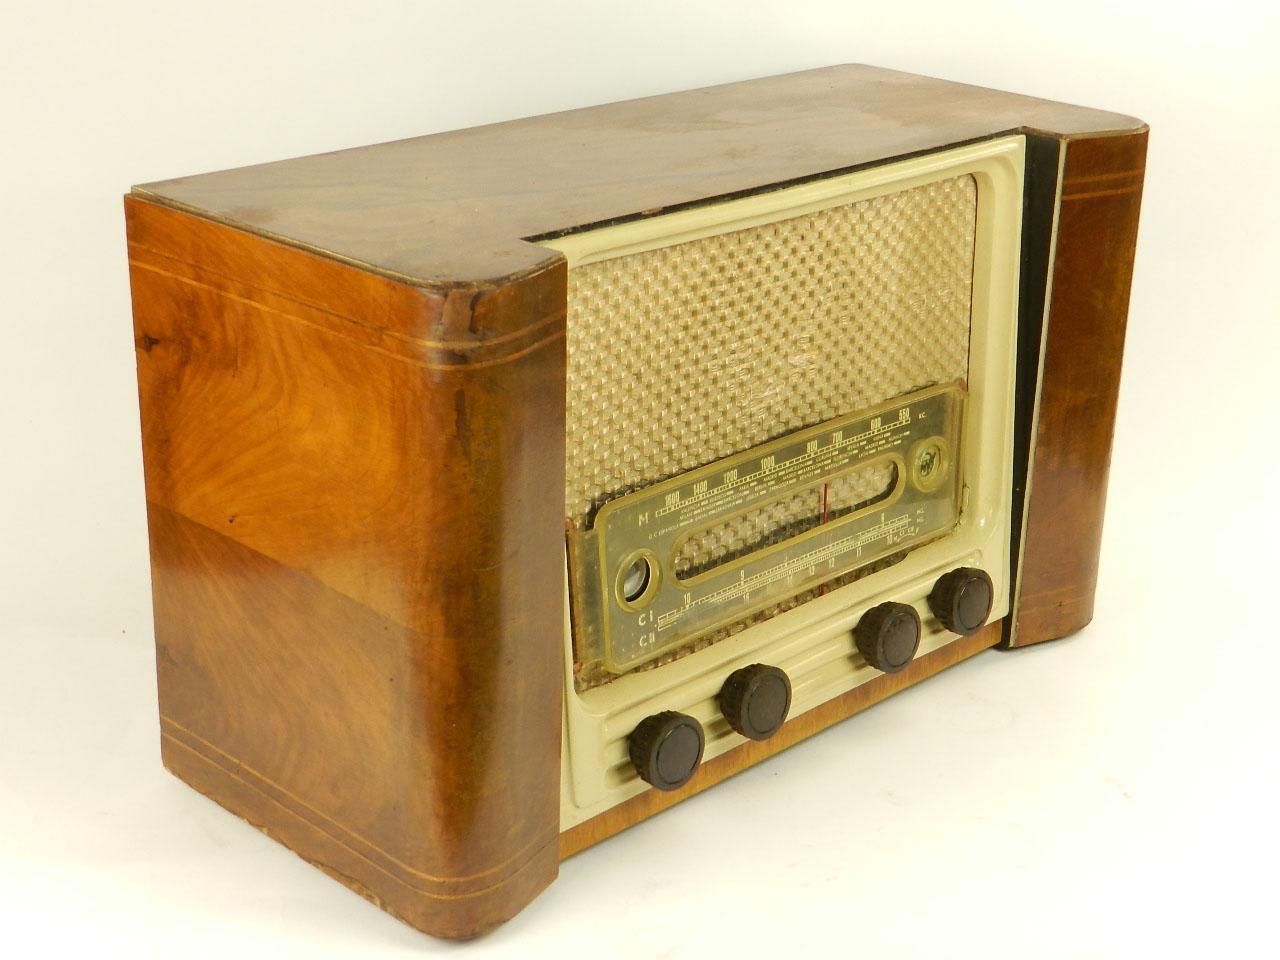 Imagen RADIO MARFIL AN-355 O.M  AÑO 1950 25923